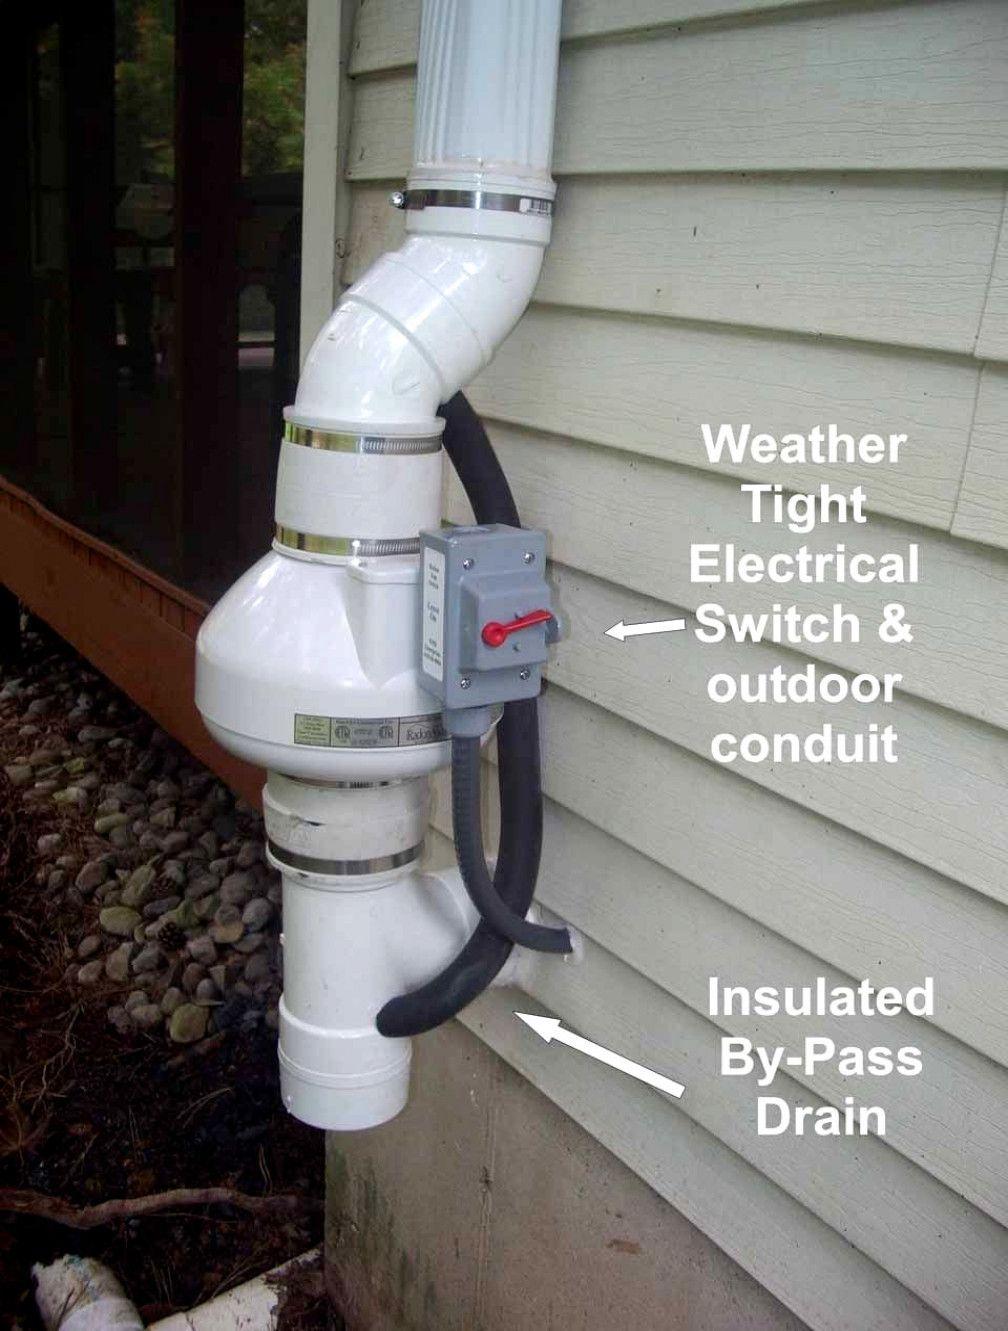 Radon Ventilation System For Basements Basementflooring Ventilation System Basement Ventilation Radon